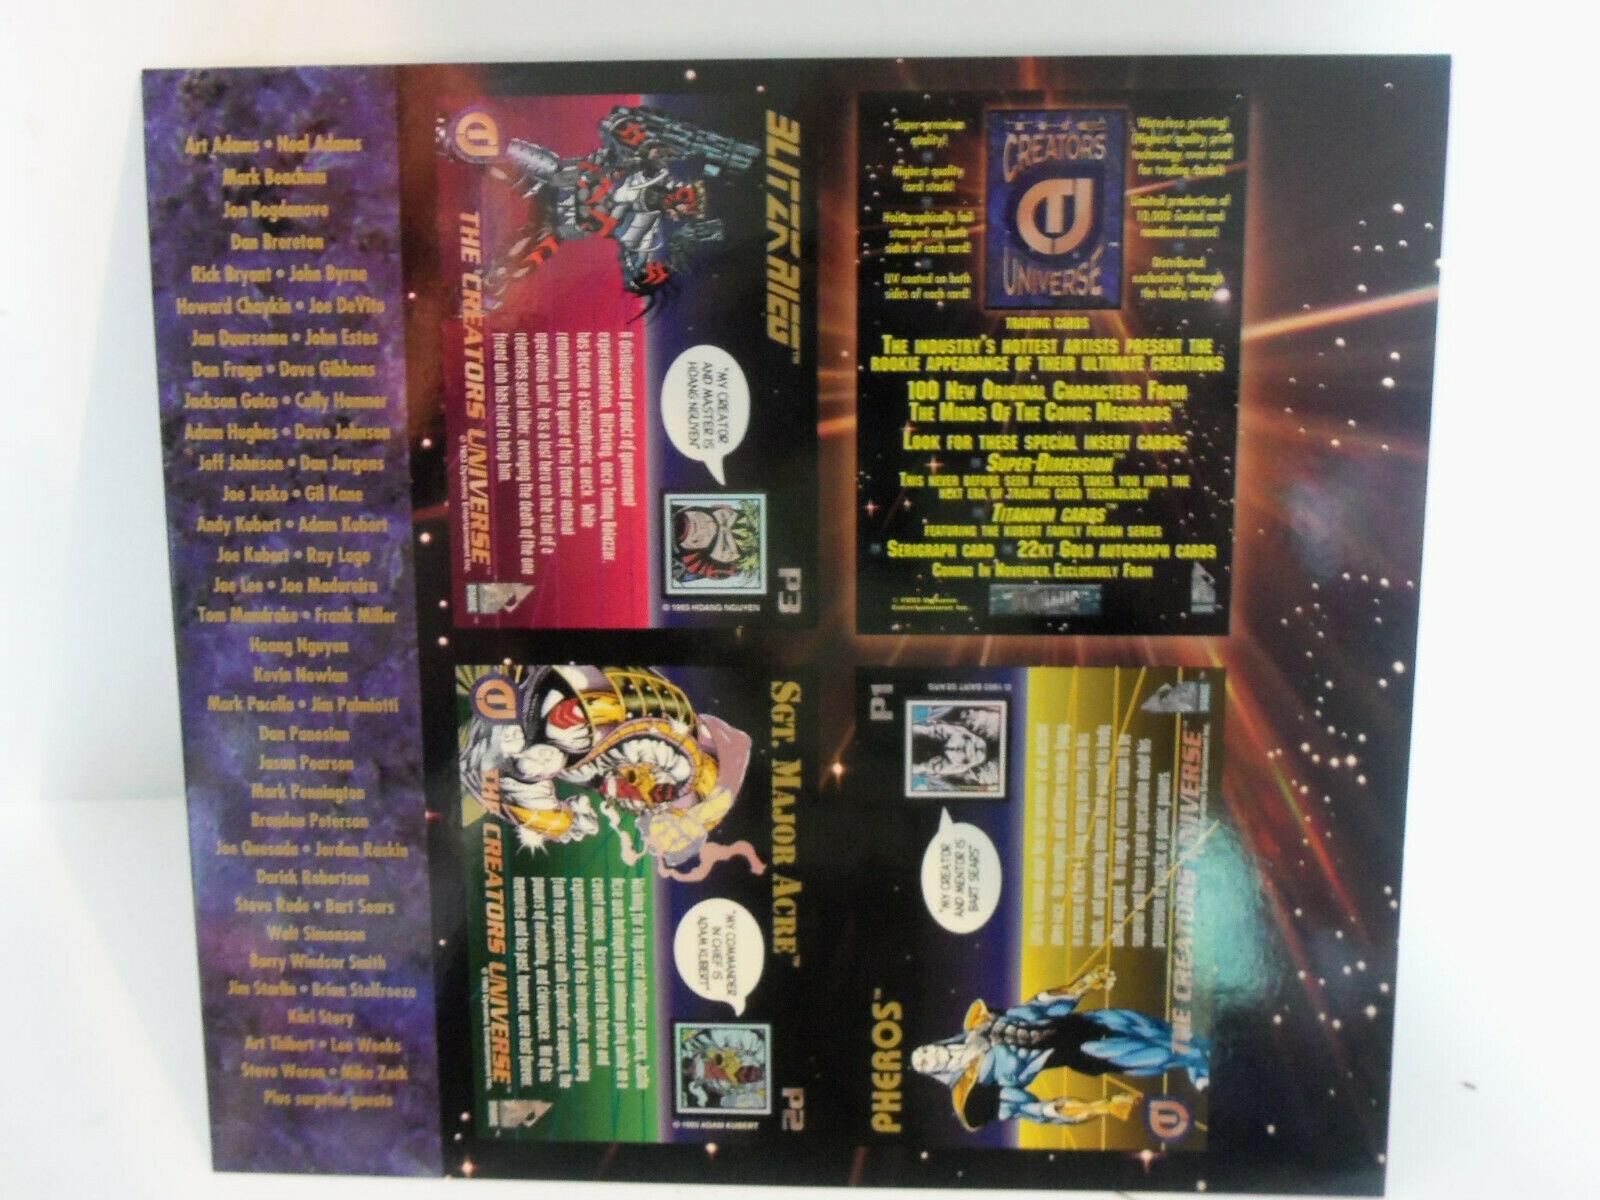 Vintage 1993 CREATOR'S UNIVERSE Uncut PROMO Cards Sheet Kubert Jusko Sears Nguye image 4